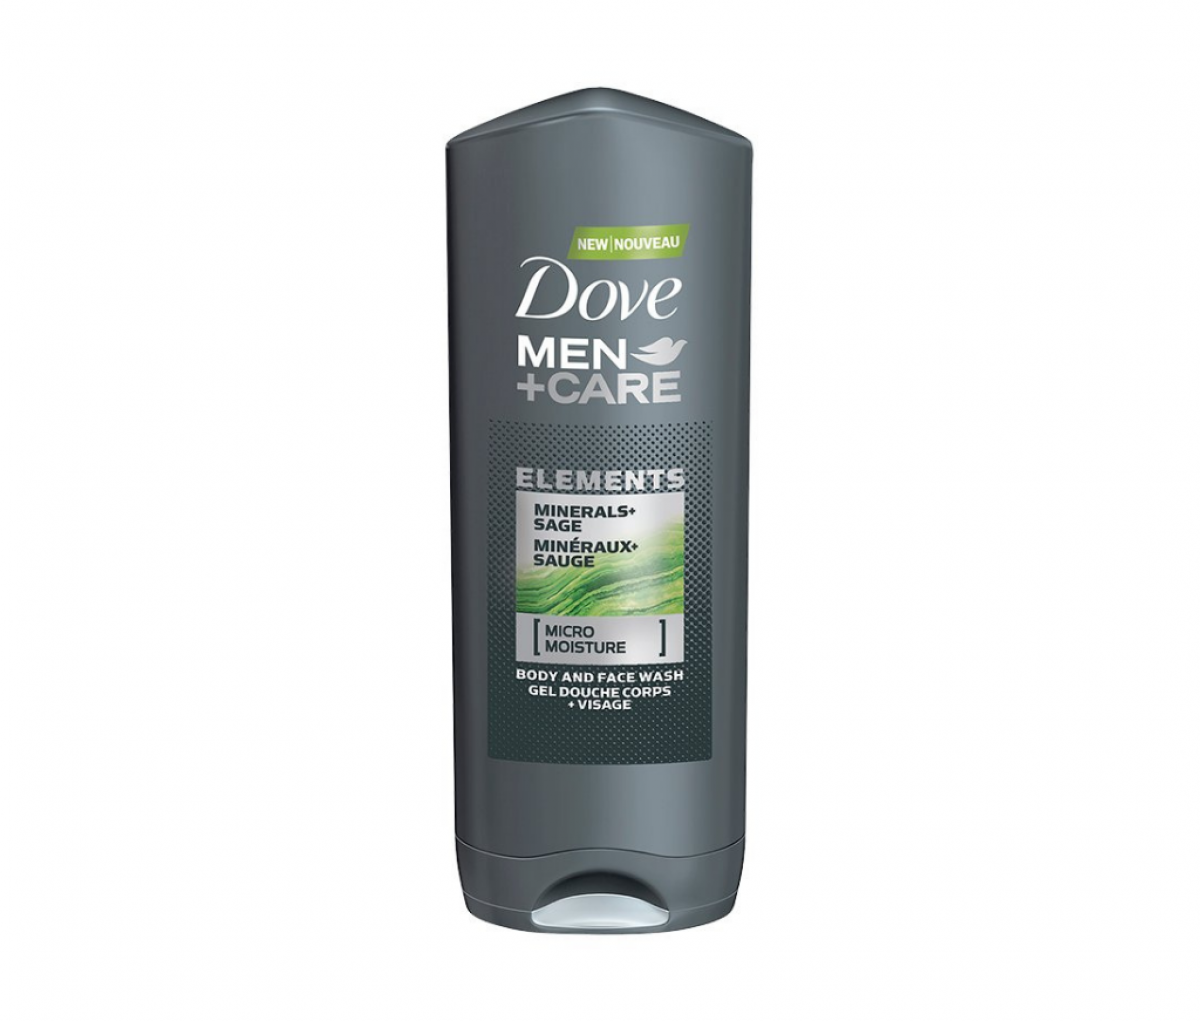 Dove 400ml Minerals+Sage Body & Face Wash